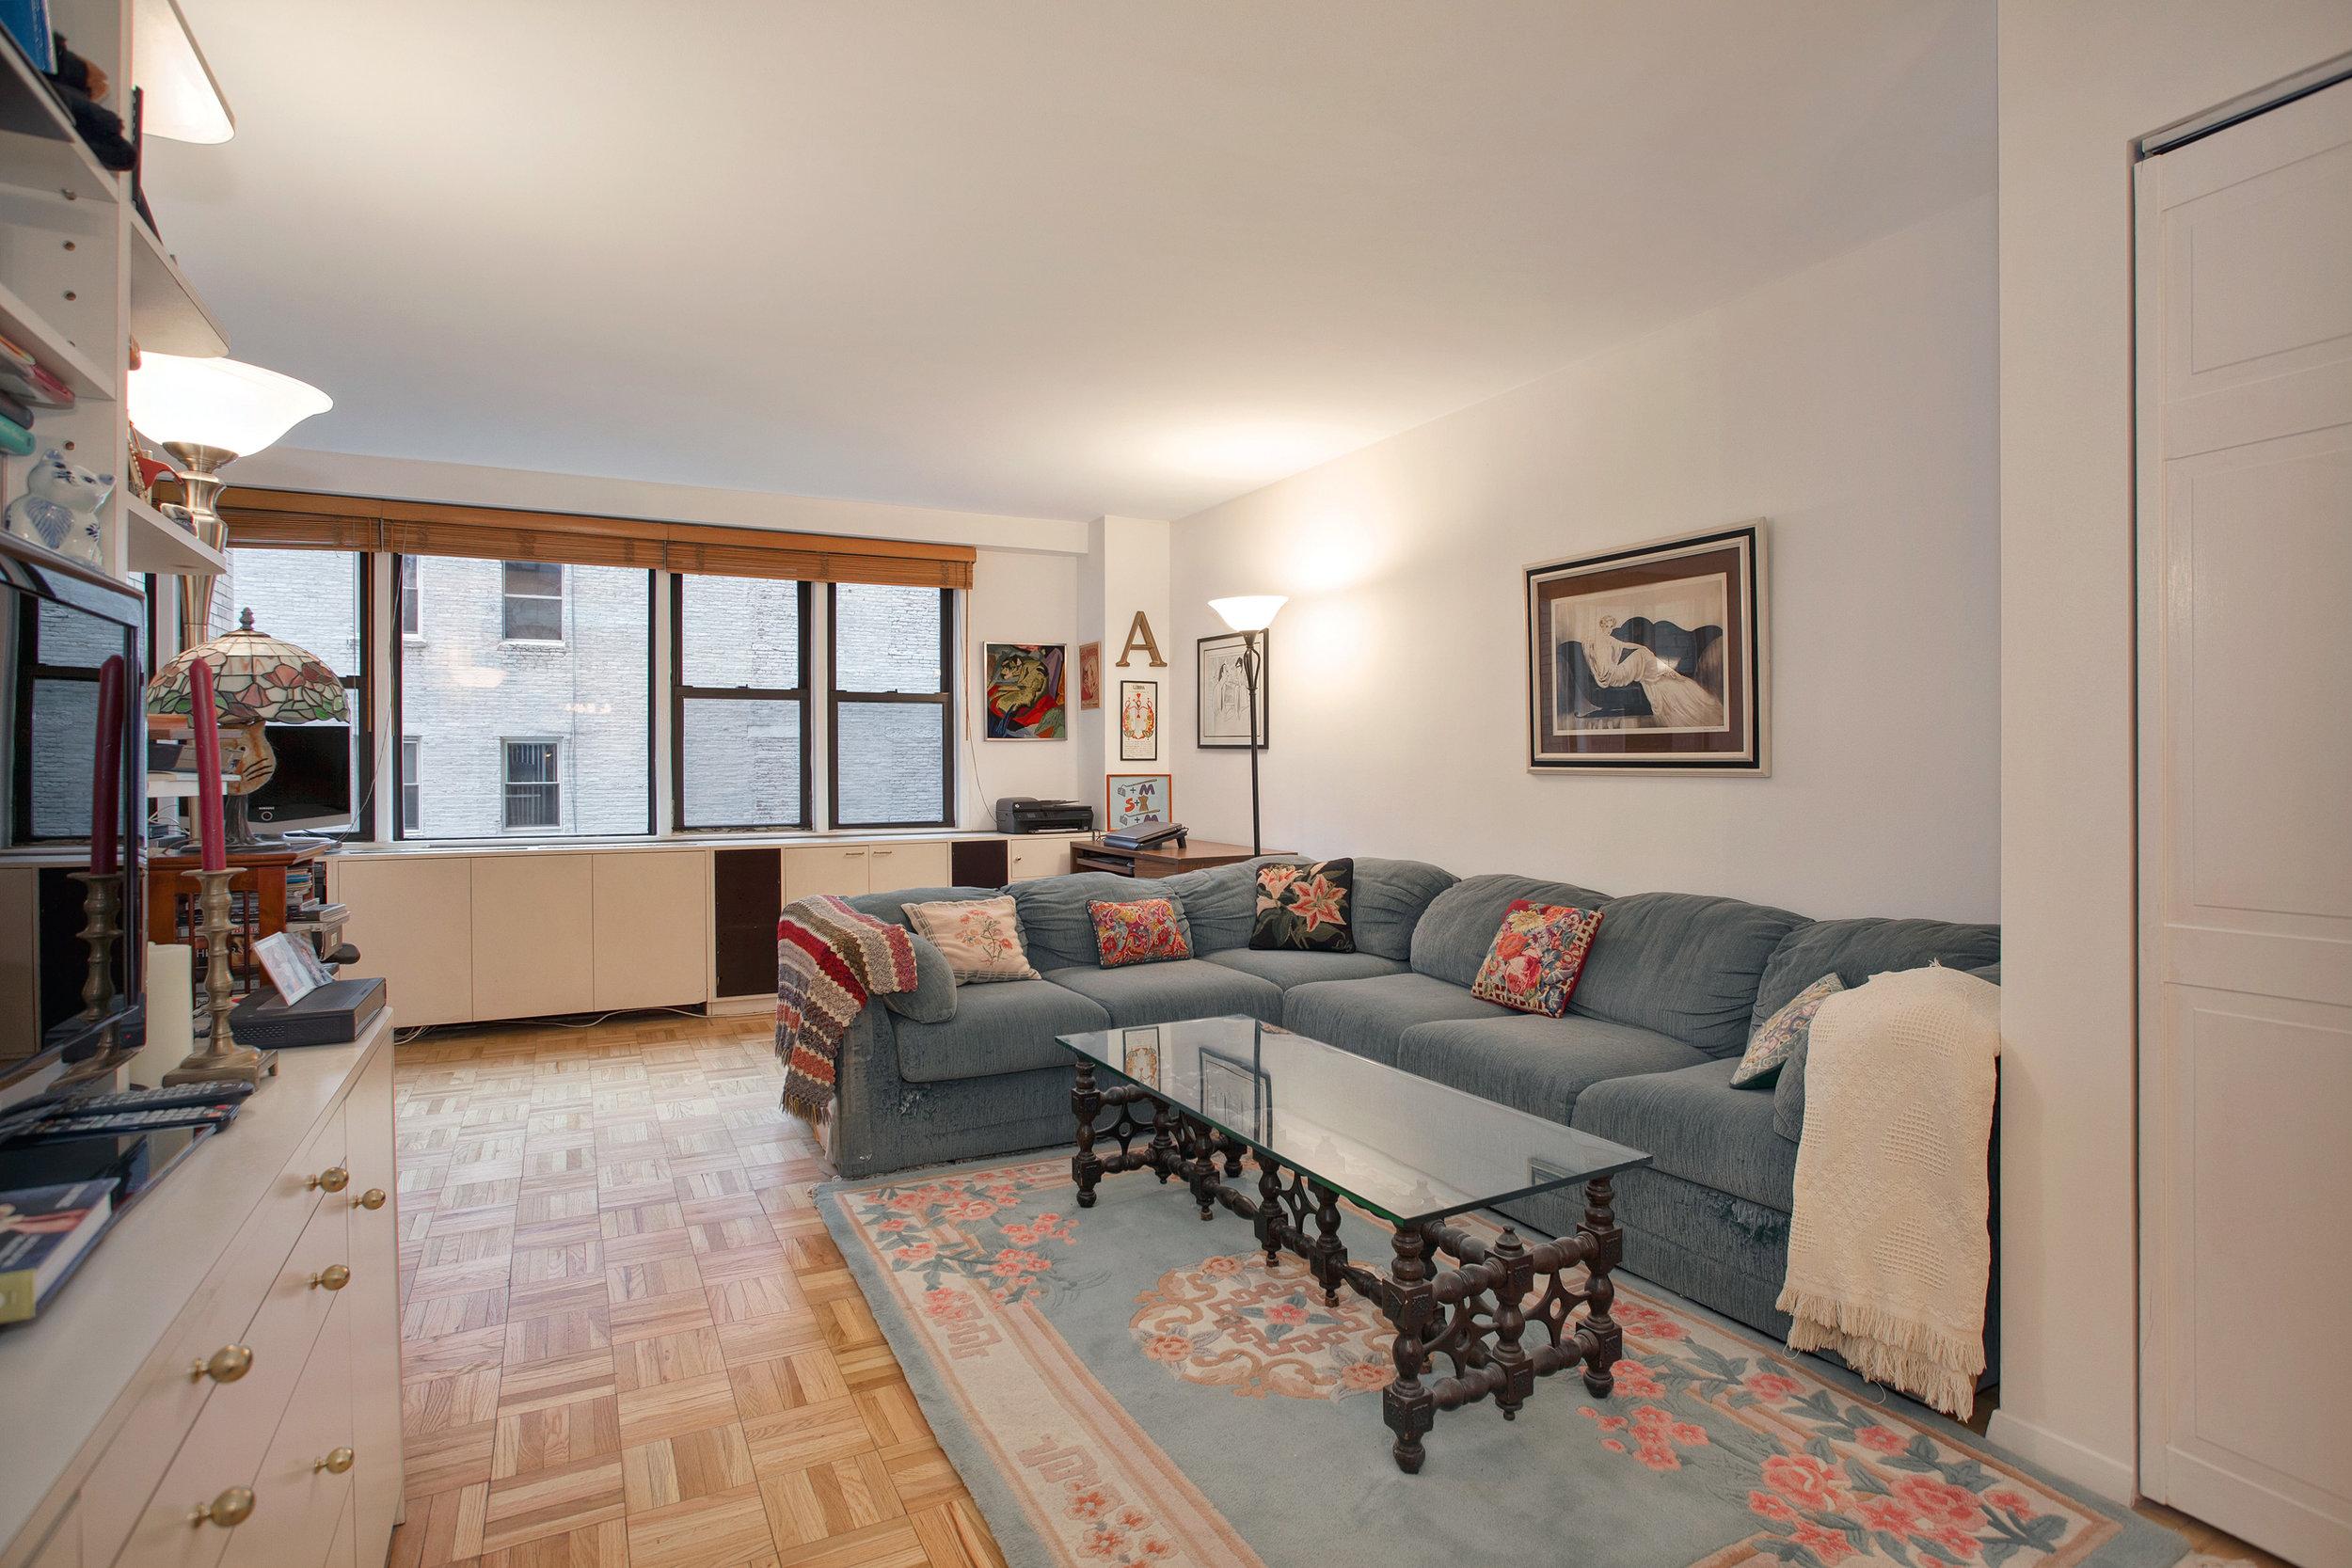 201 East 21st Street, Unit 4L - $550,000